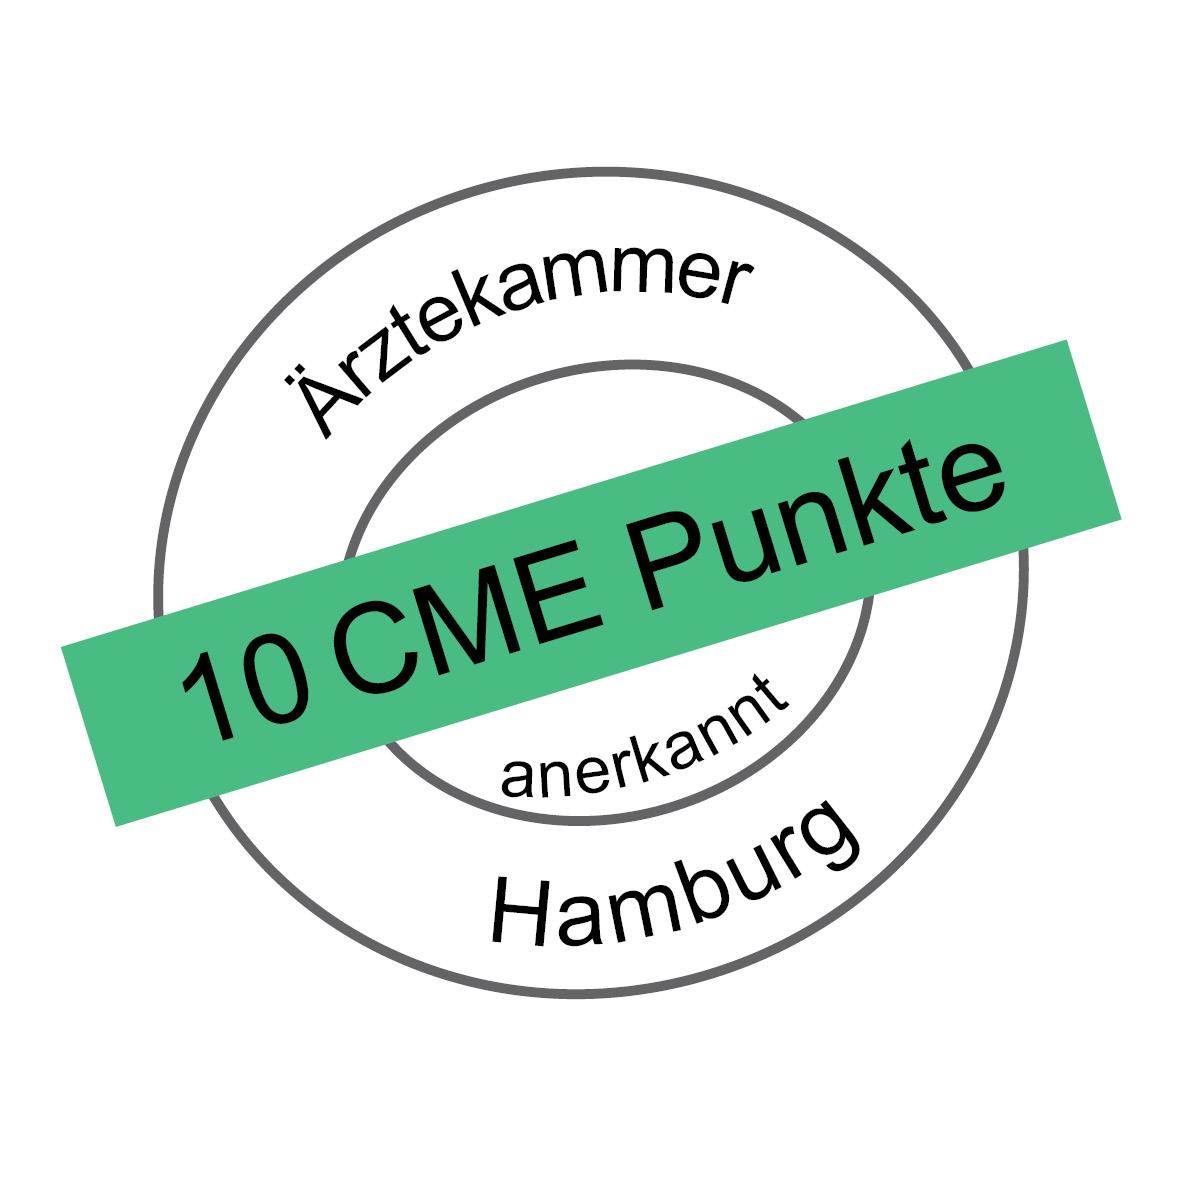 CME_Stempel_ÄK_anerkannt_Bastei-Symposium